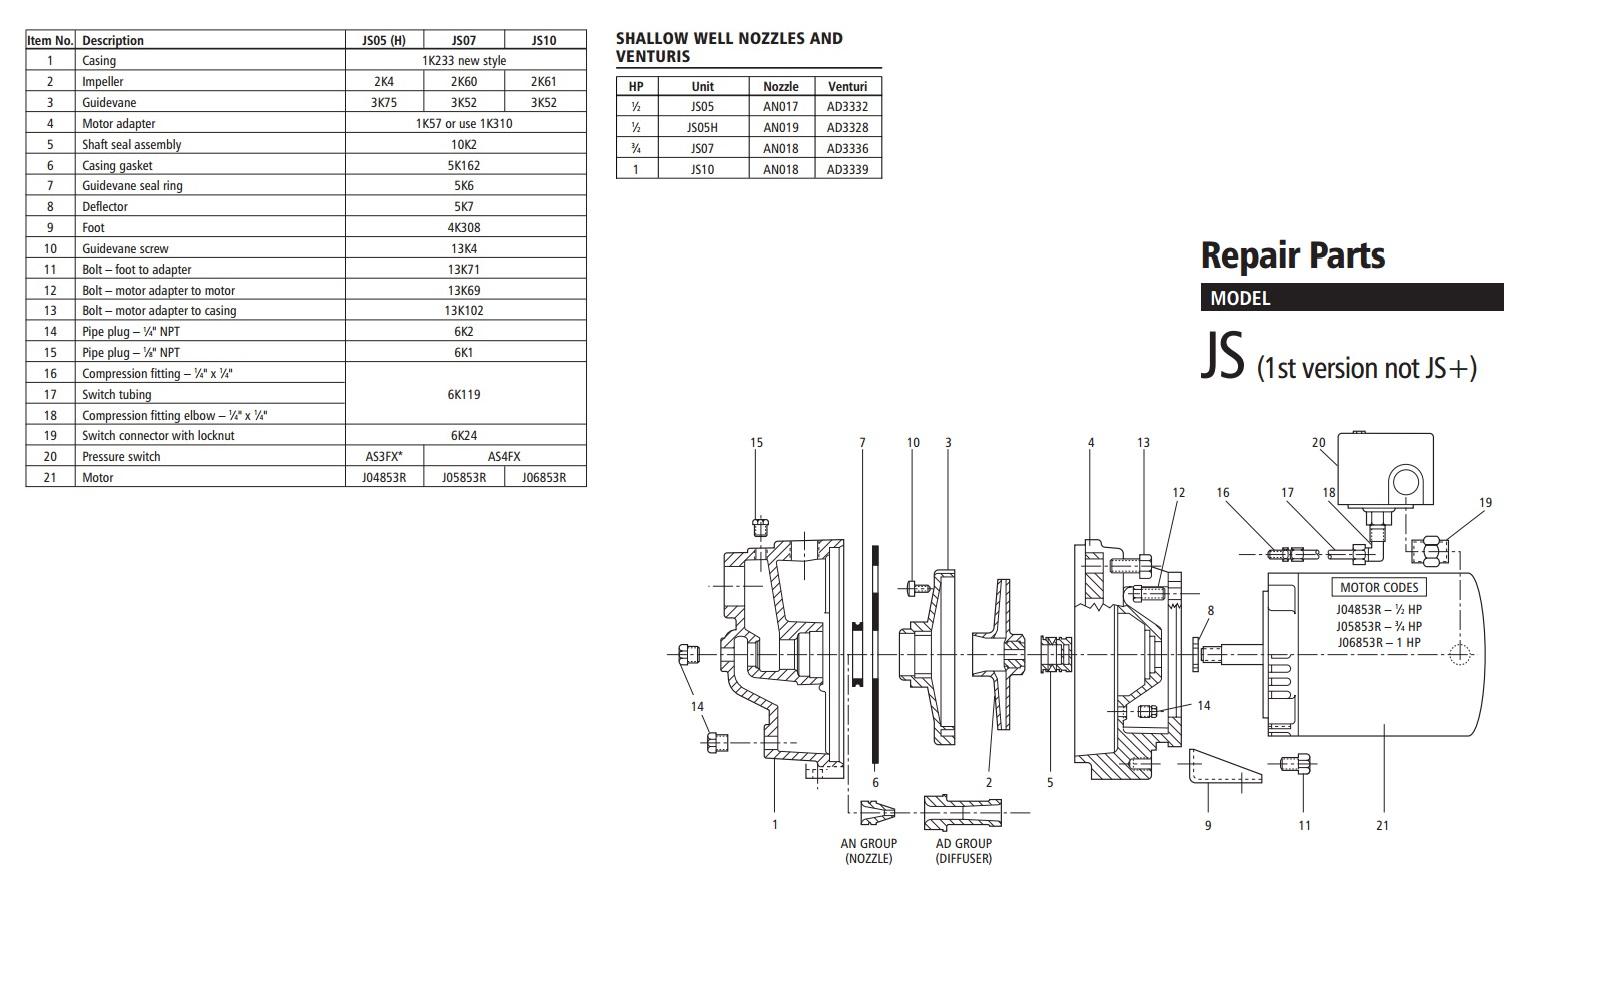 munchkin mk0040-001 rev.1 instruction manual